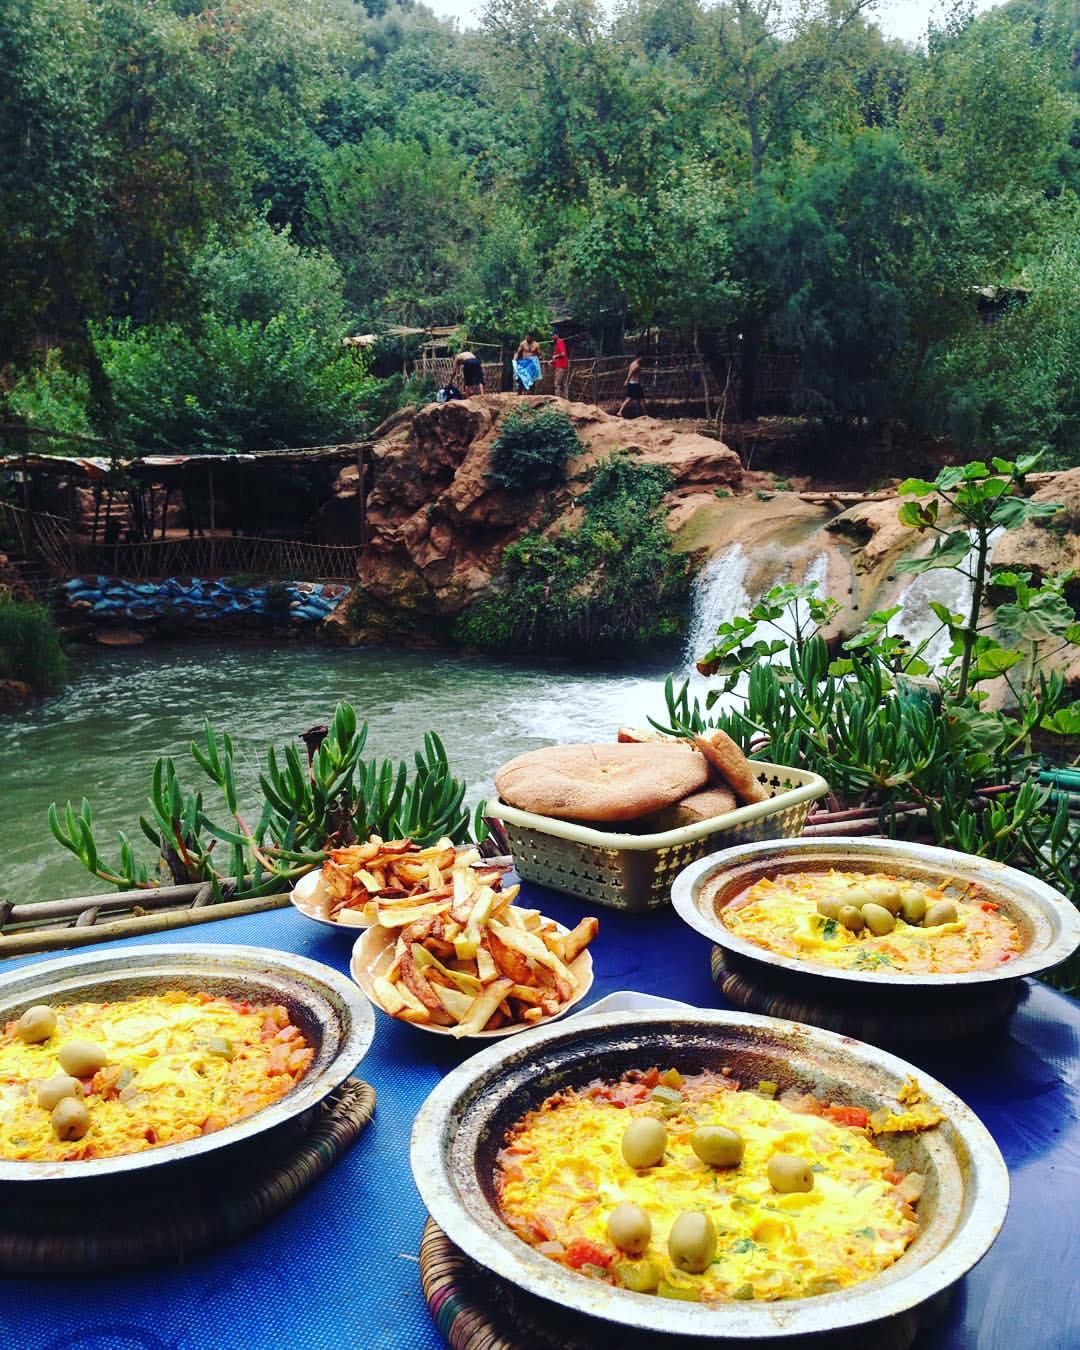 Moroccan Feast with a view, best food yet! Berber omelette 👌🏽💙🍳💚💦 @ashleybeer @hannahirschfeld